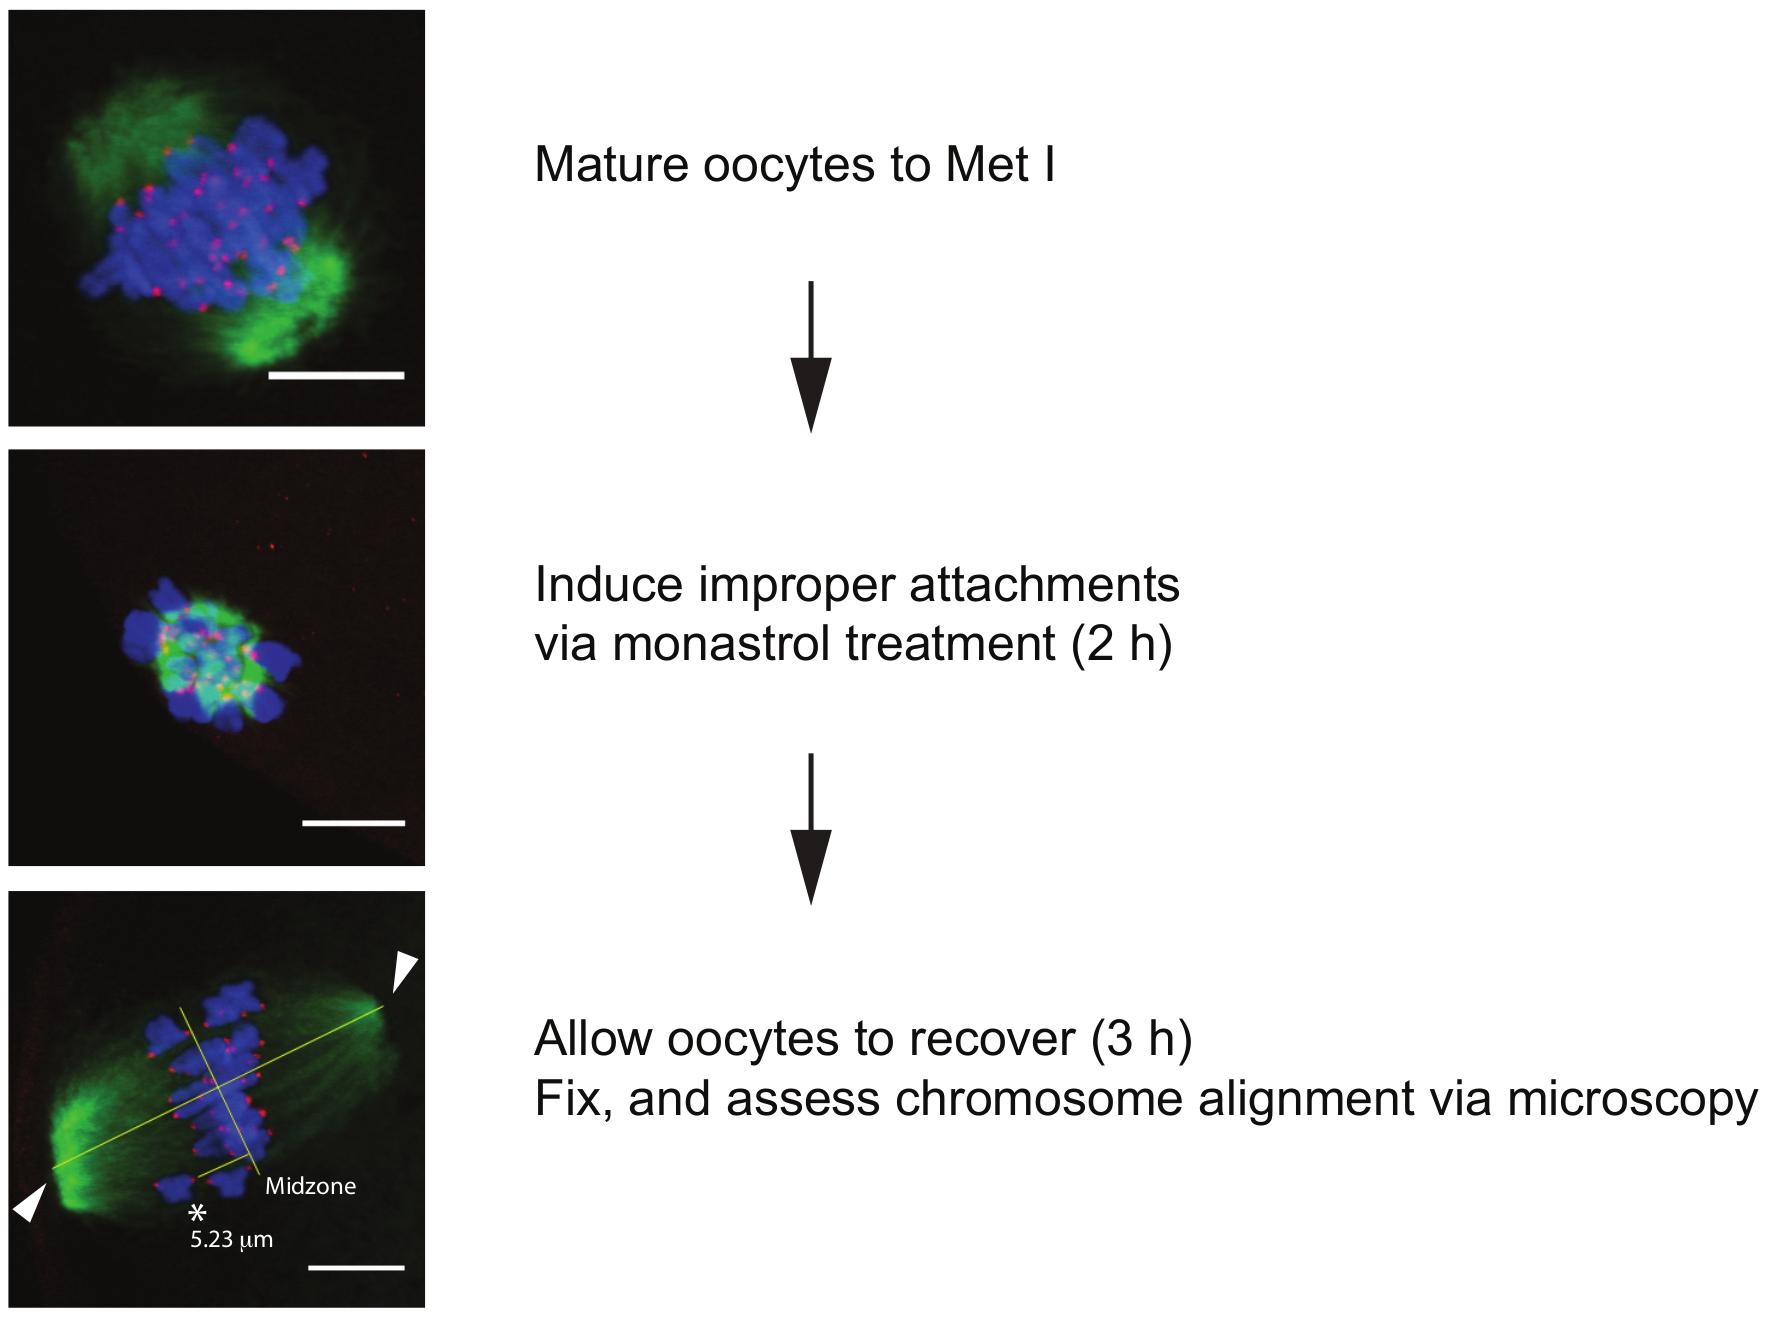 assess functionality sperm oocytes Mammalian to